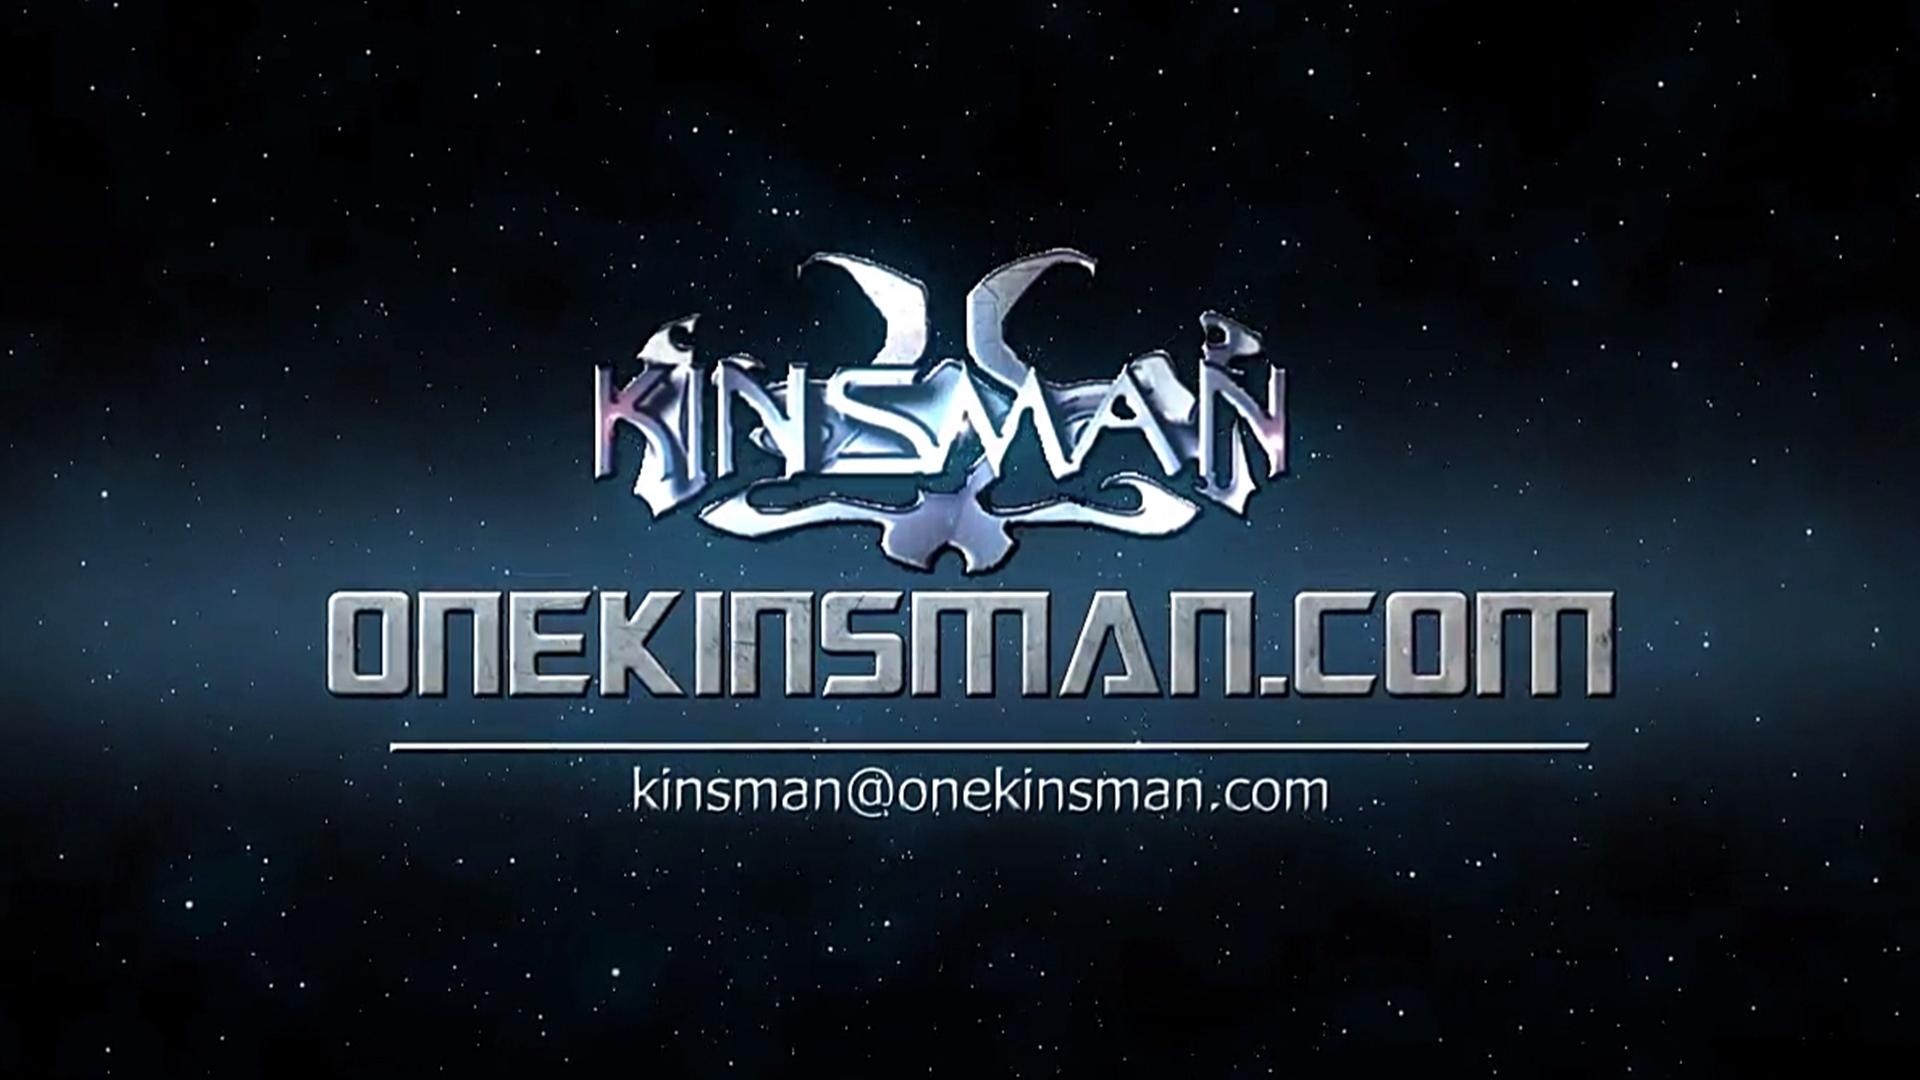 Kinsman Email